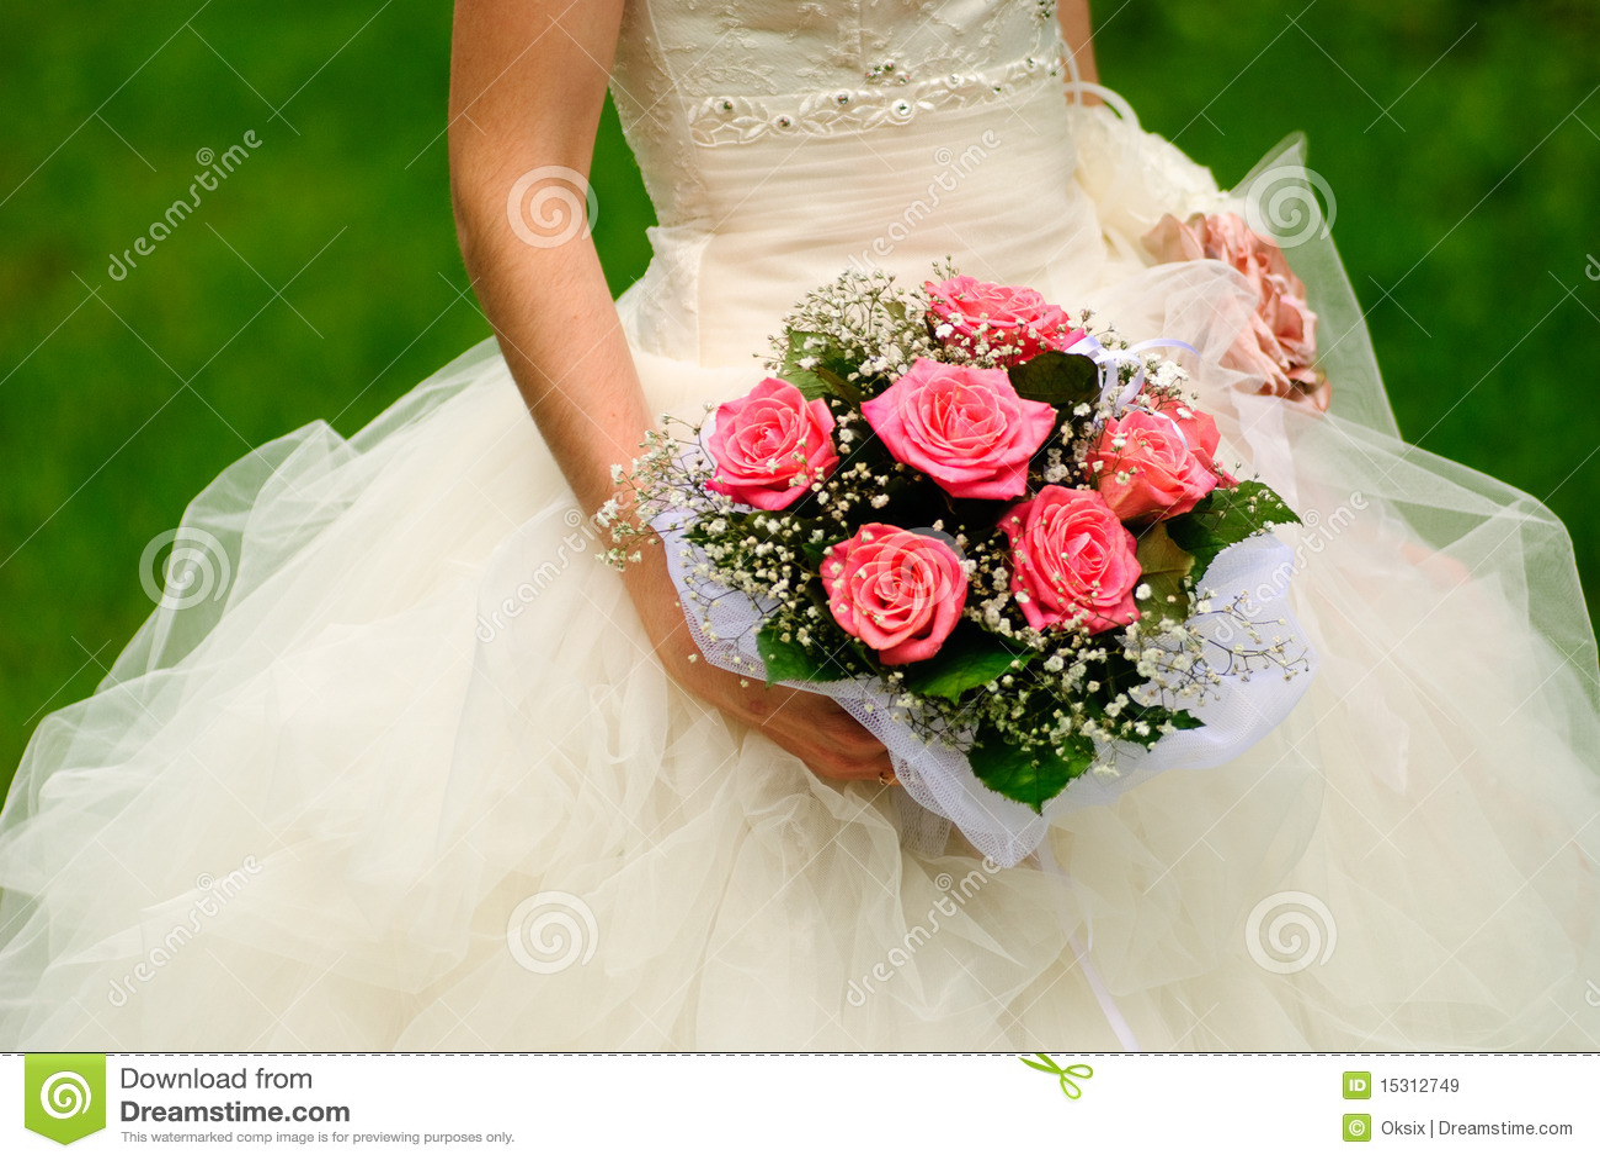 Bride throw bouquet